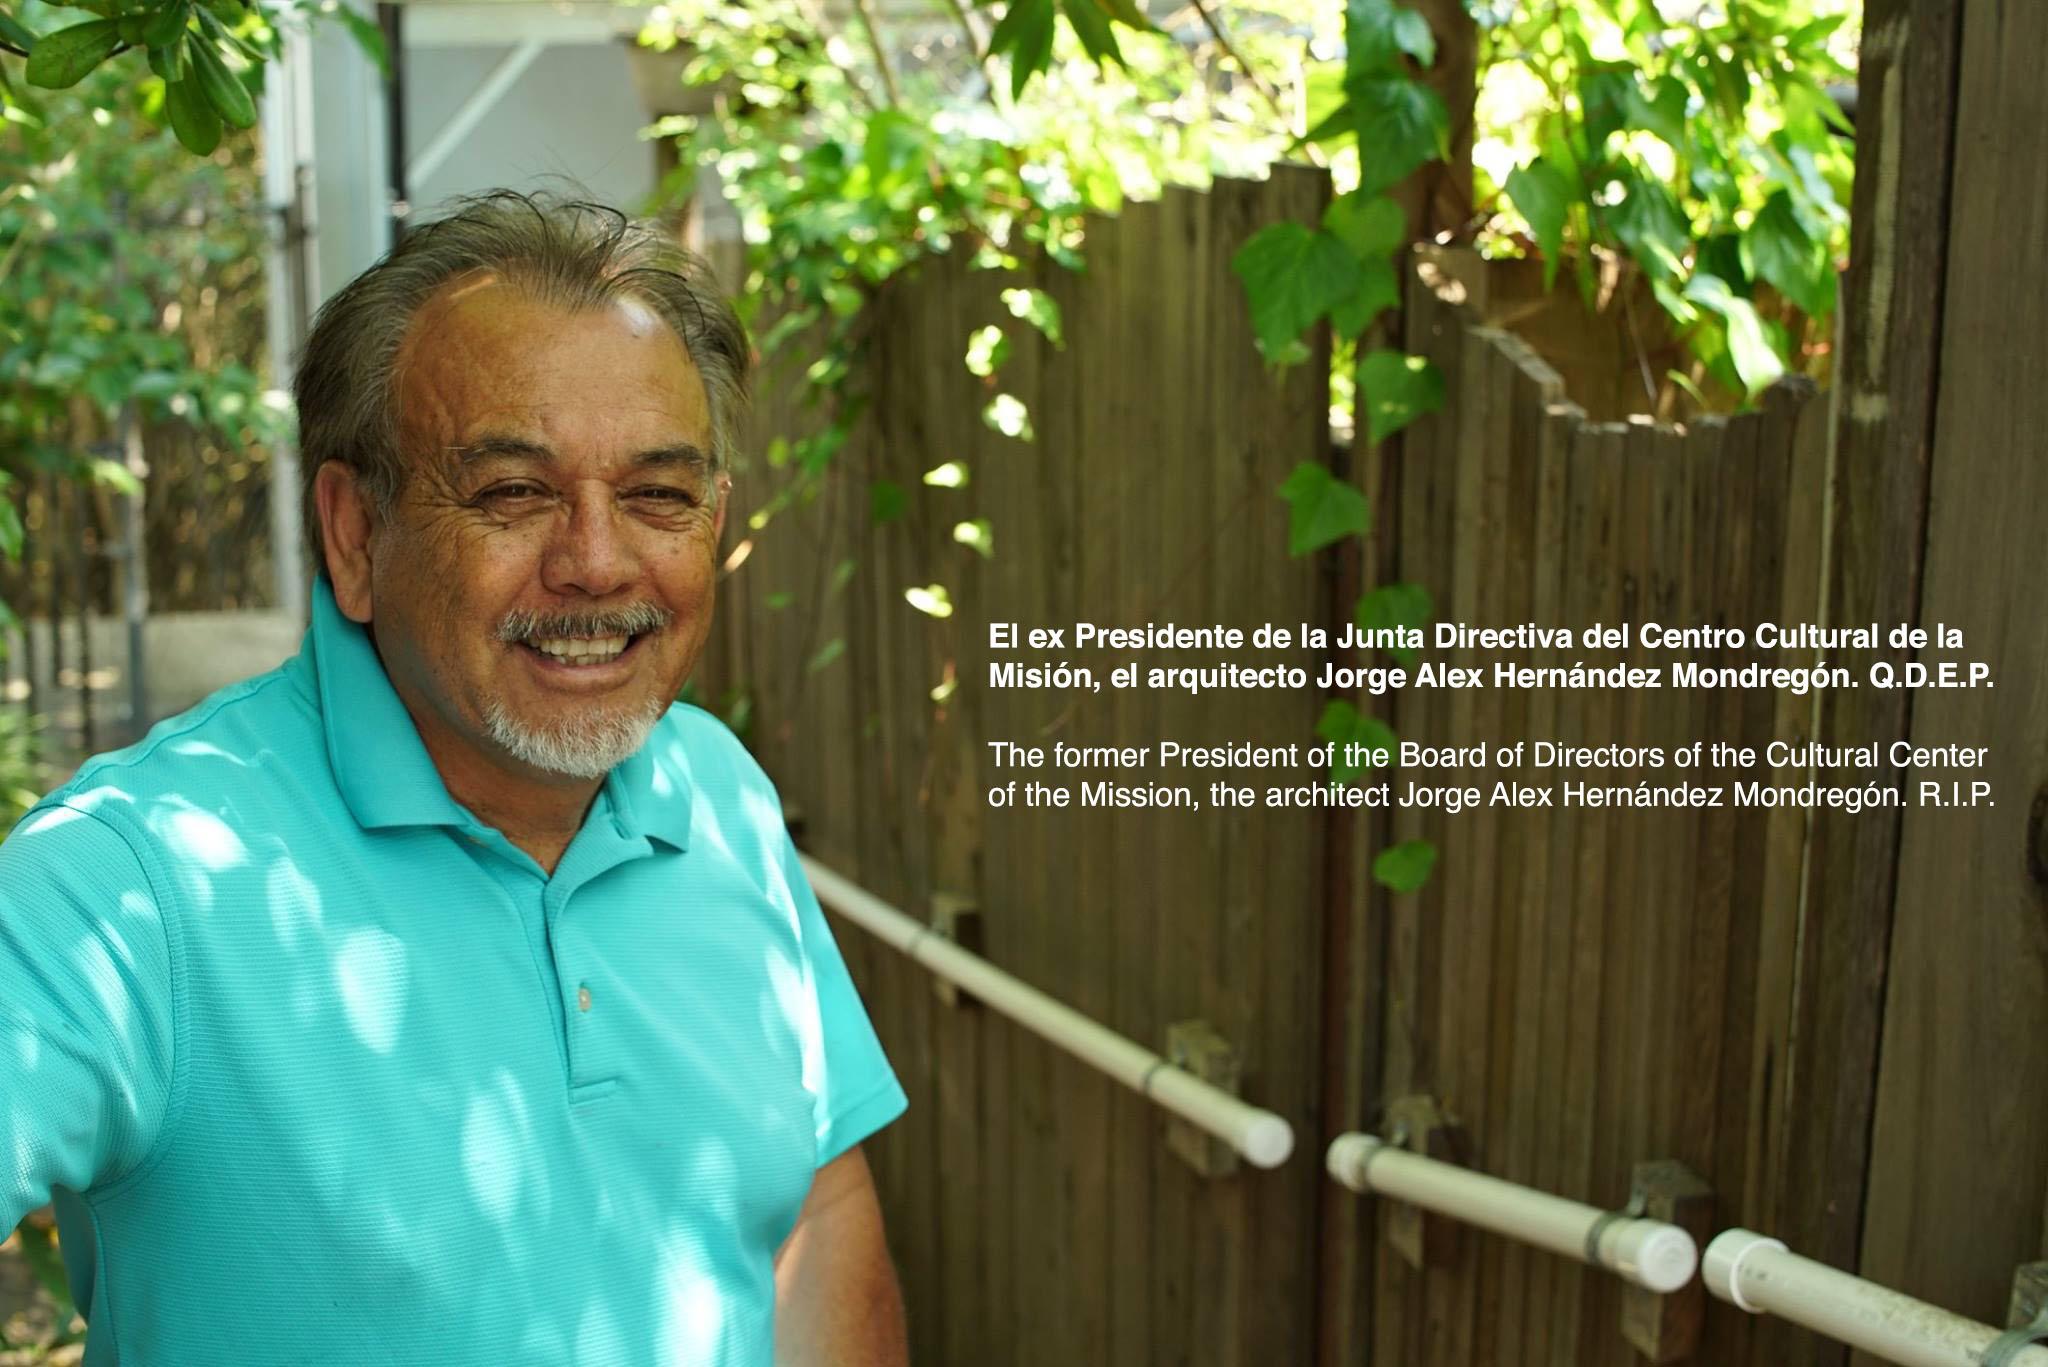 Obituary_jorge hernandez mondragon